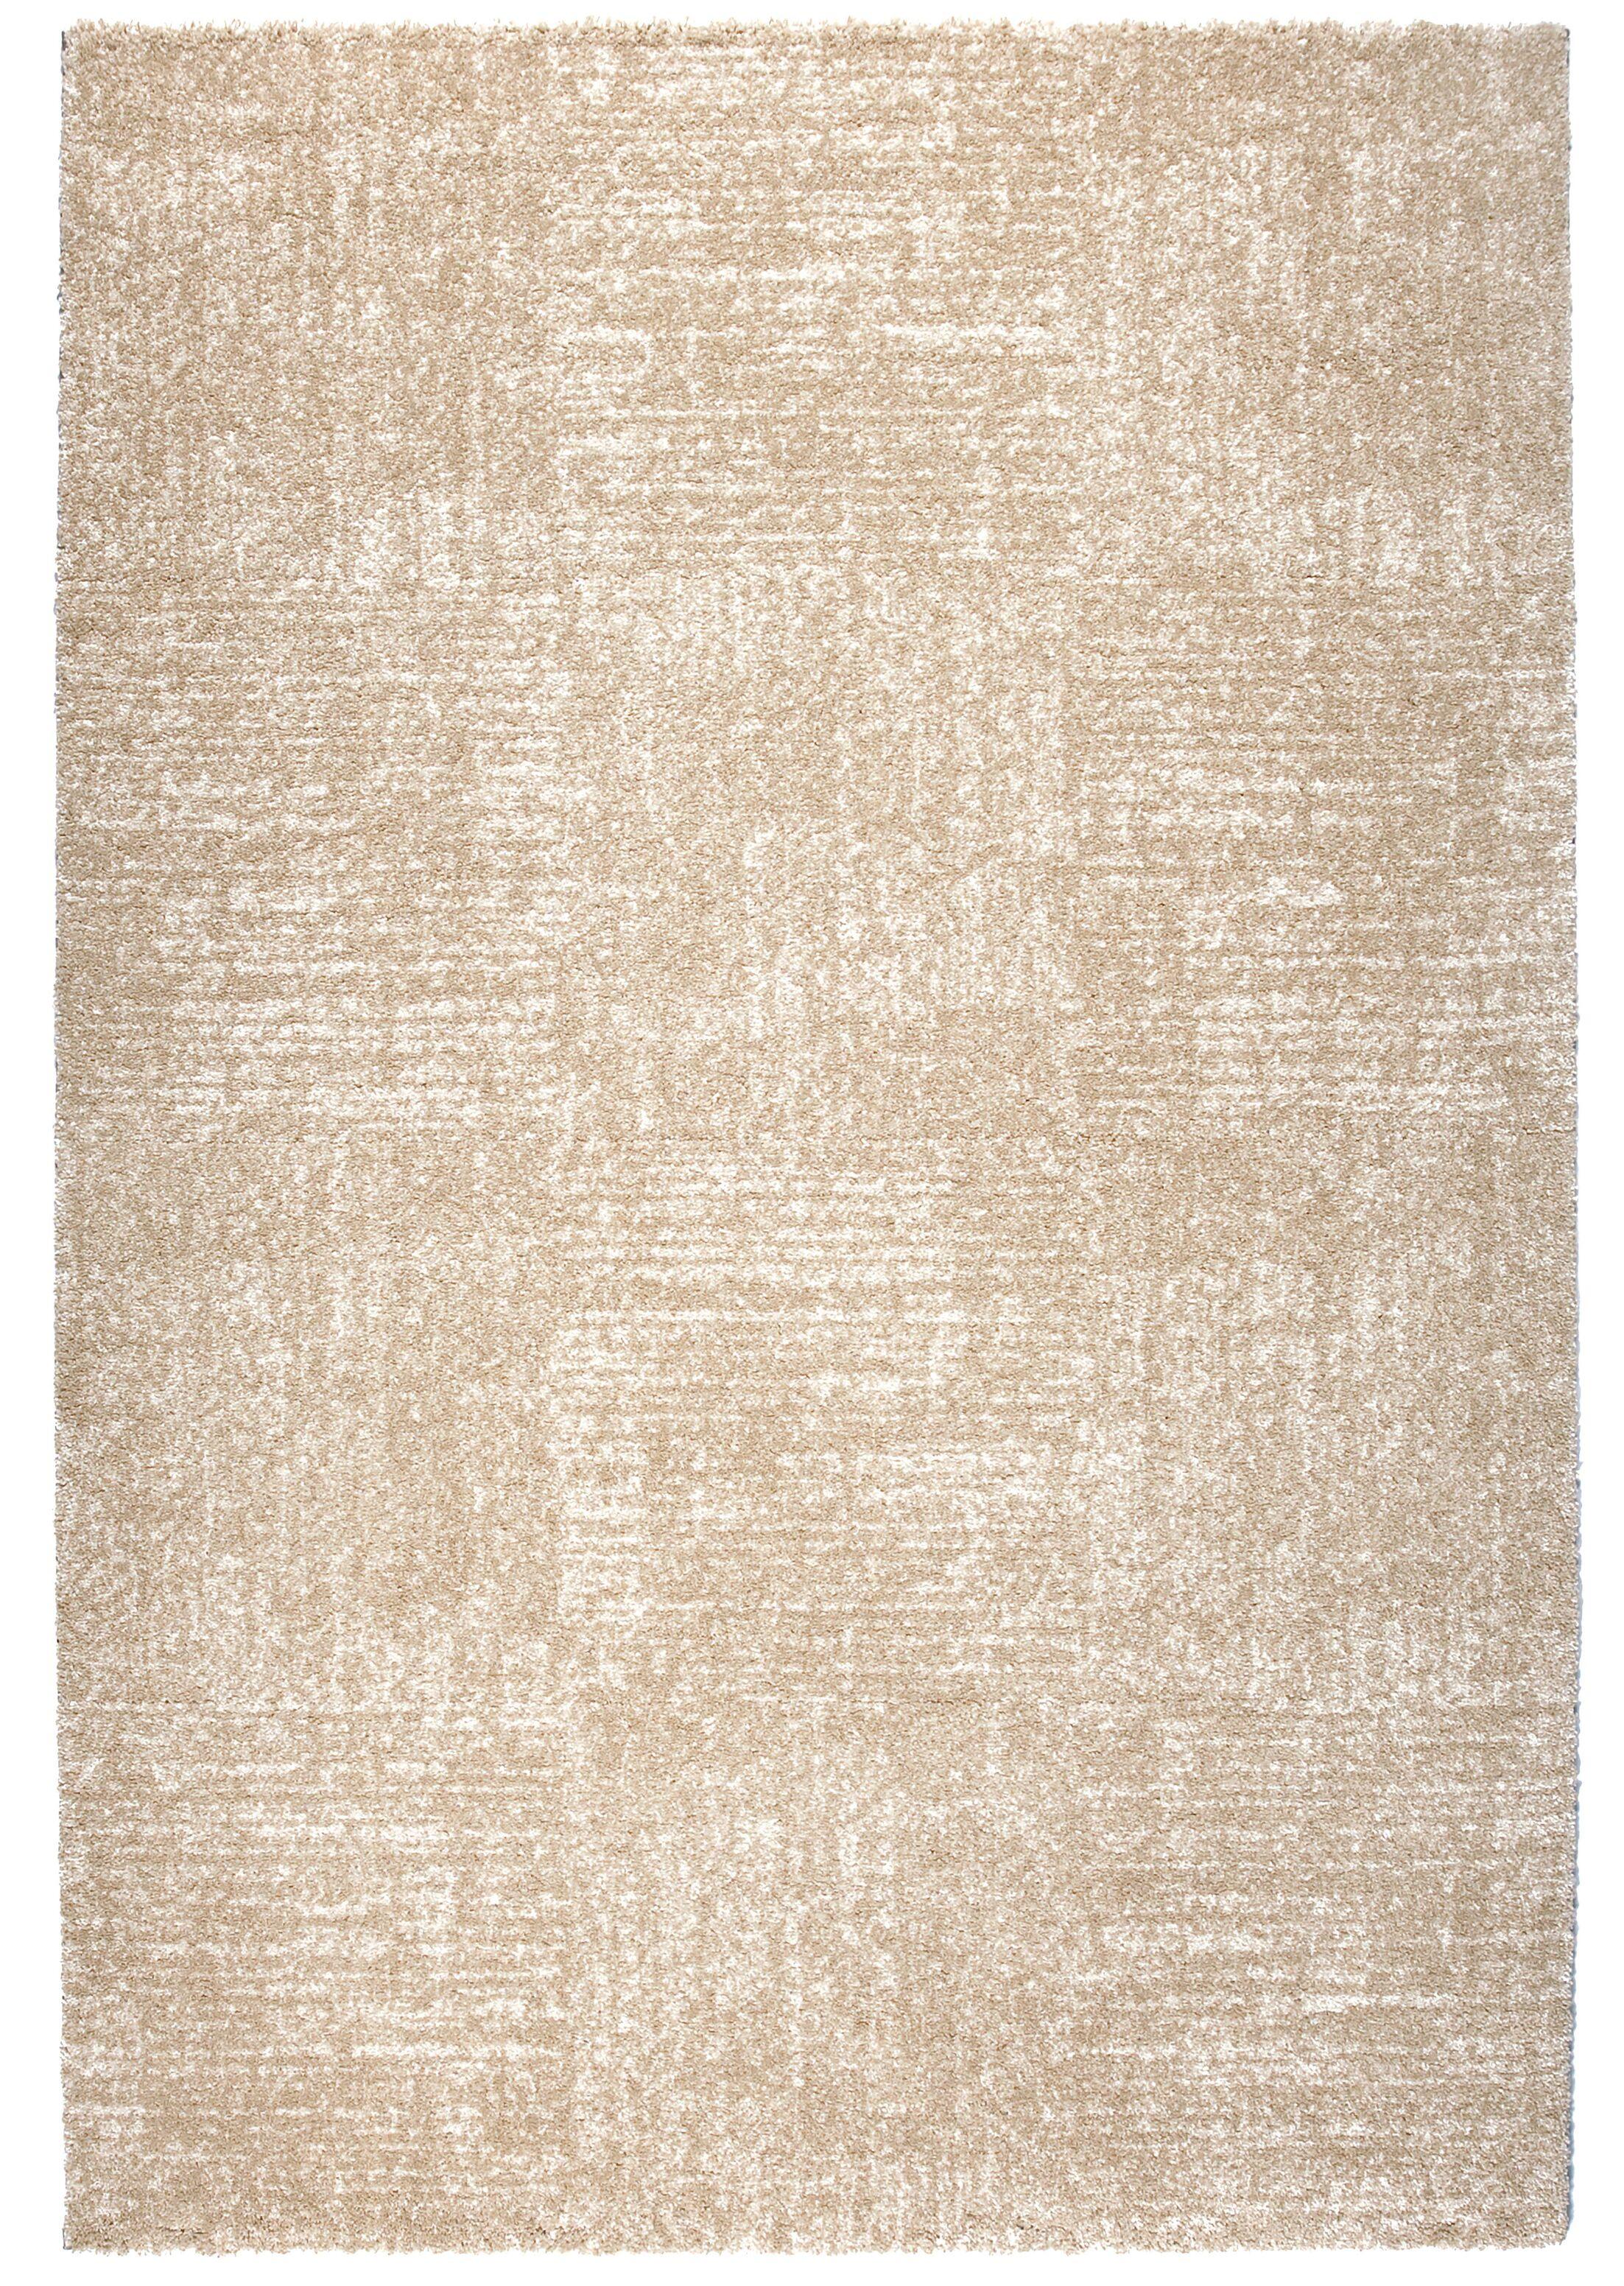 Granite Beige Area Rug Rug Size: 5'3